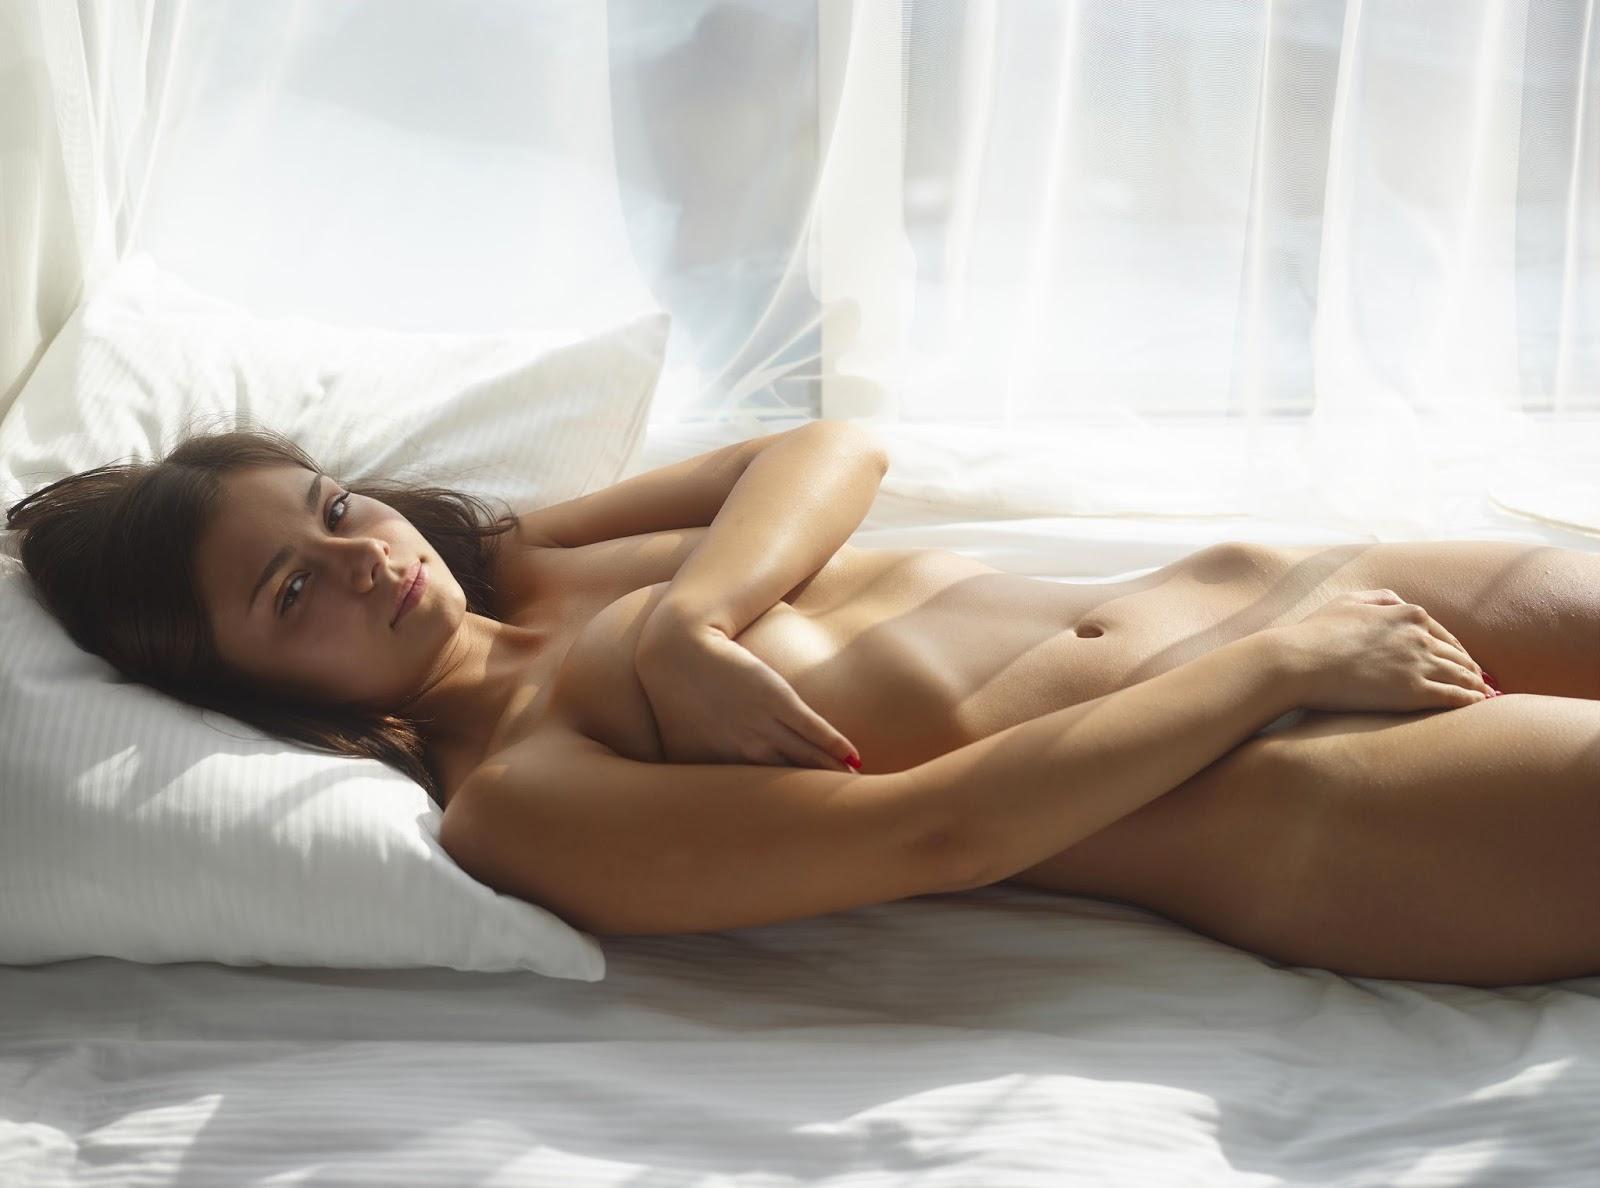 Sexy Babes - Sexy Body